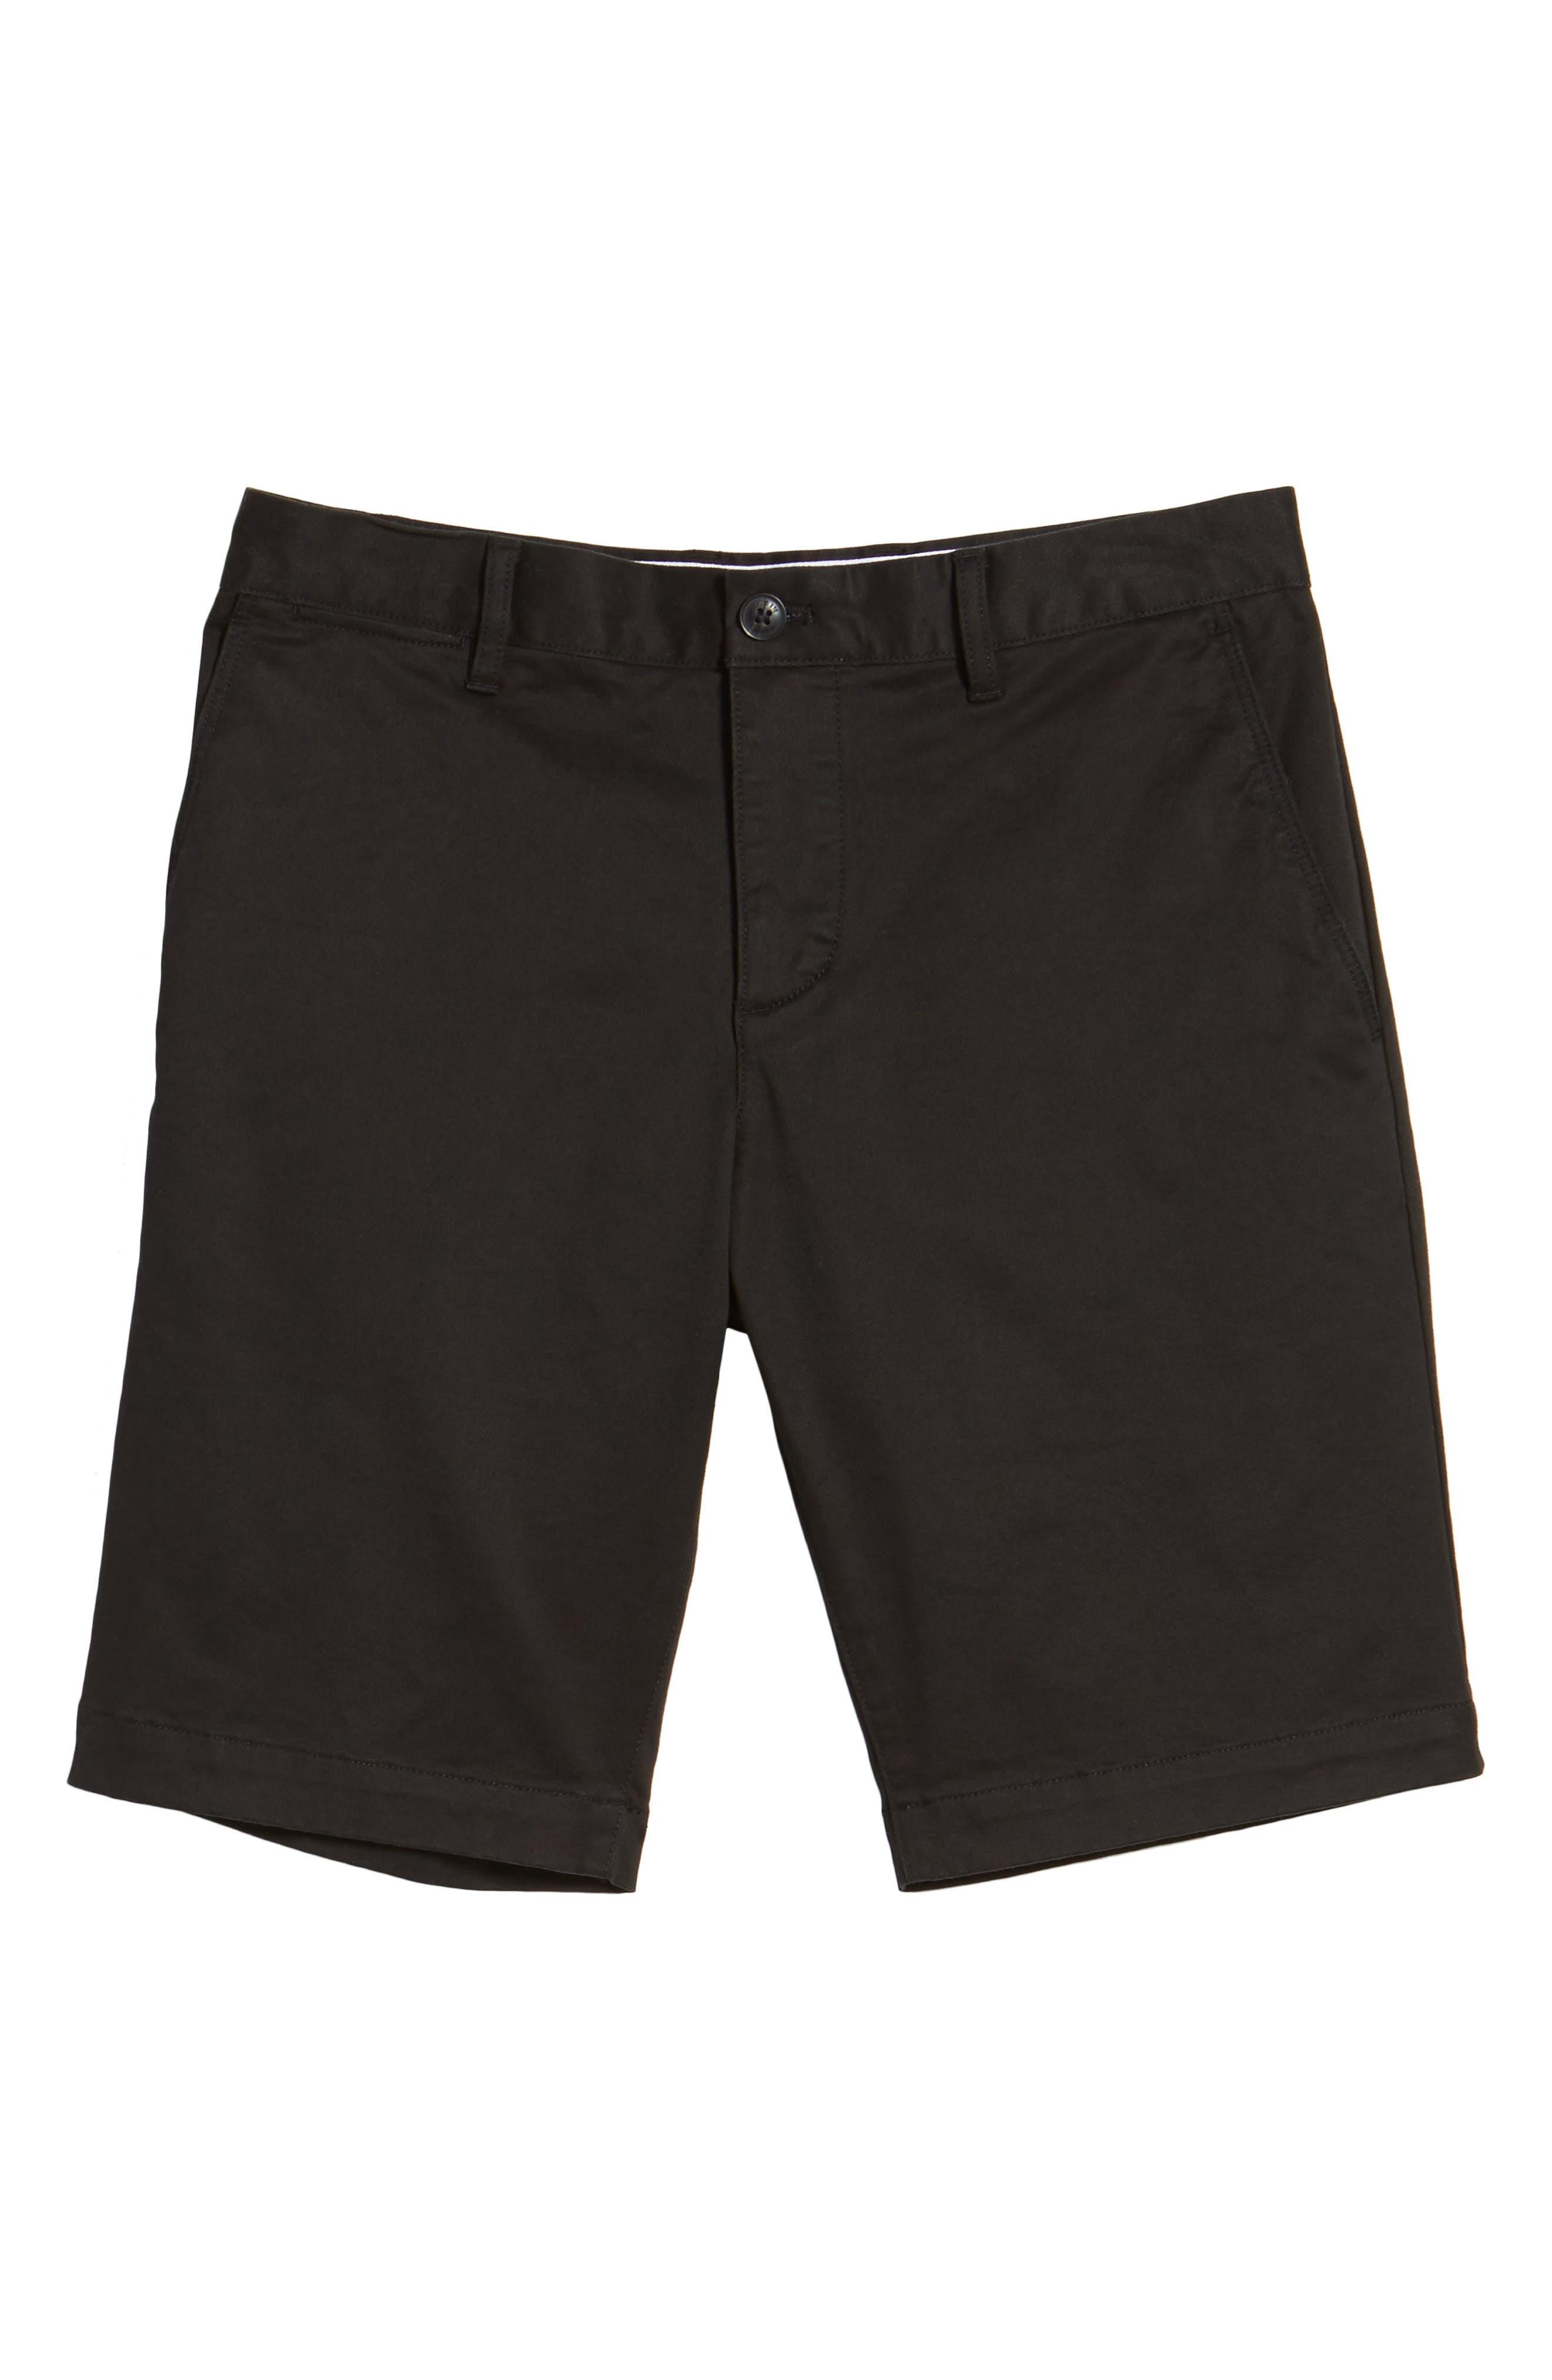 Slim Fit Chino Shorts,                             Alternate thumbnail 6, color,                             001